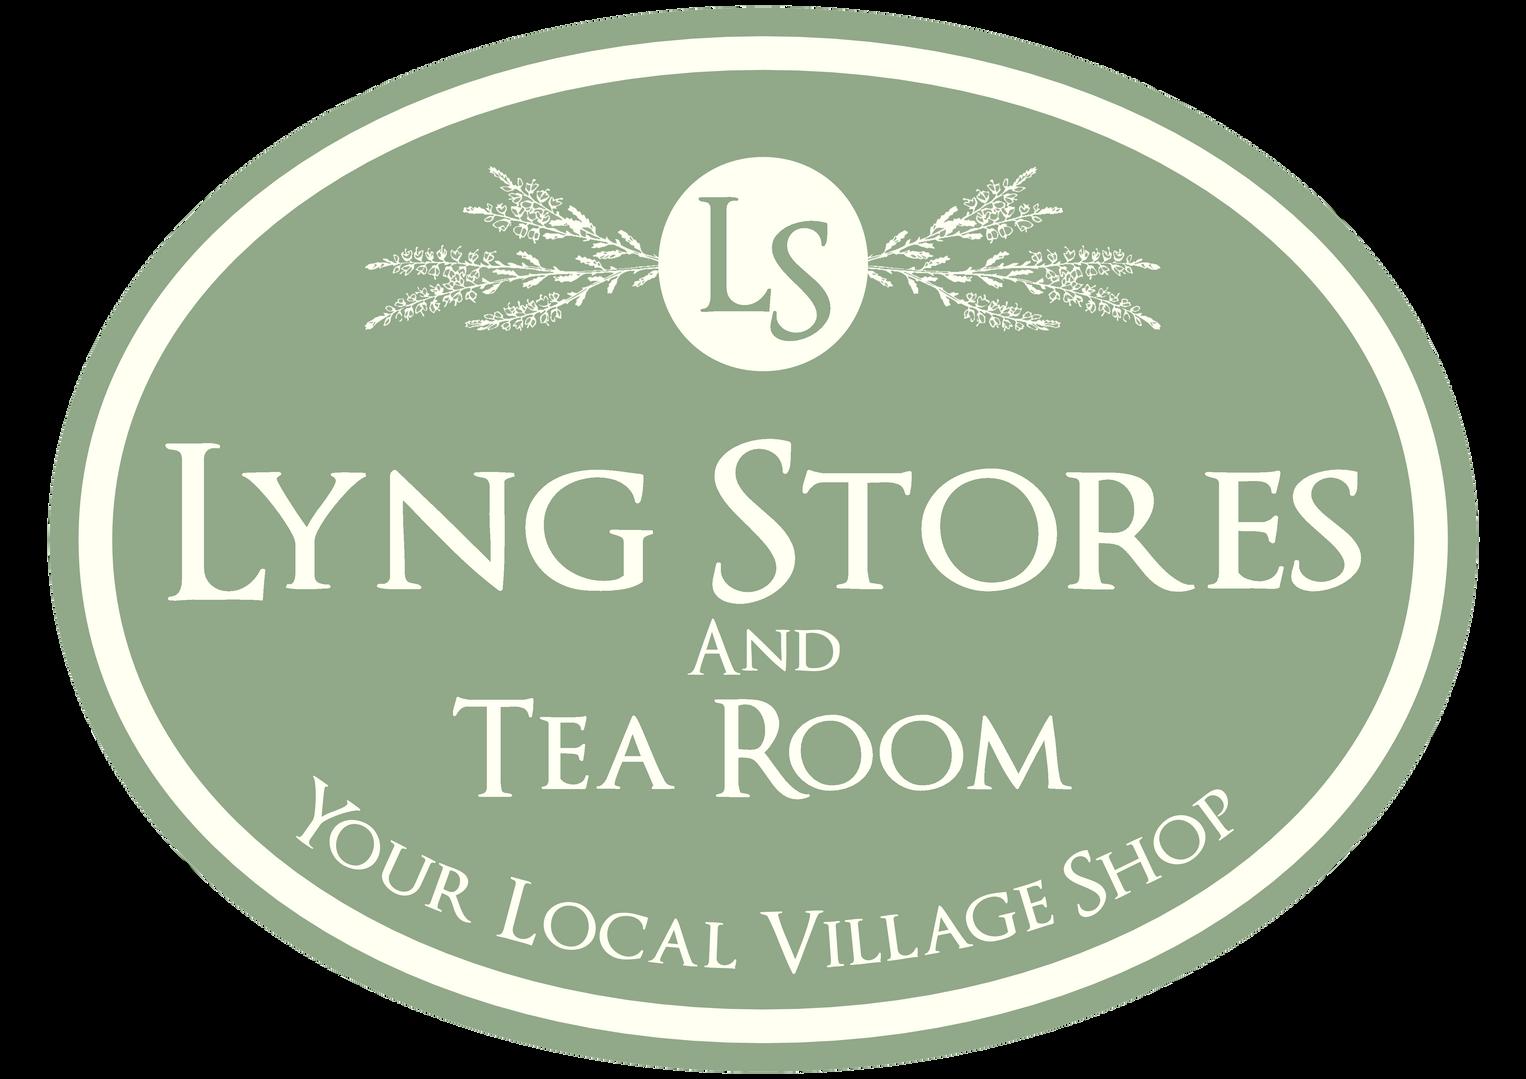 Lyng Stores & Tea Room